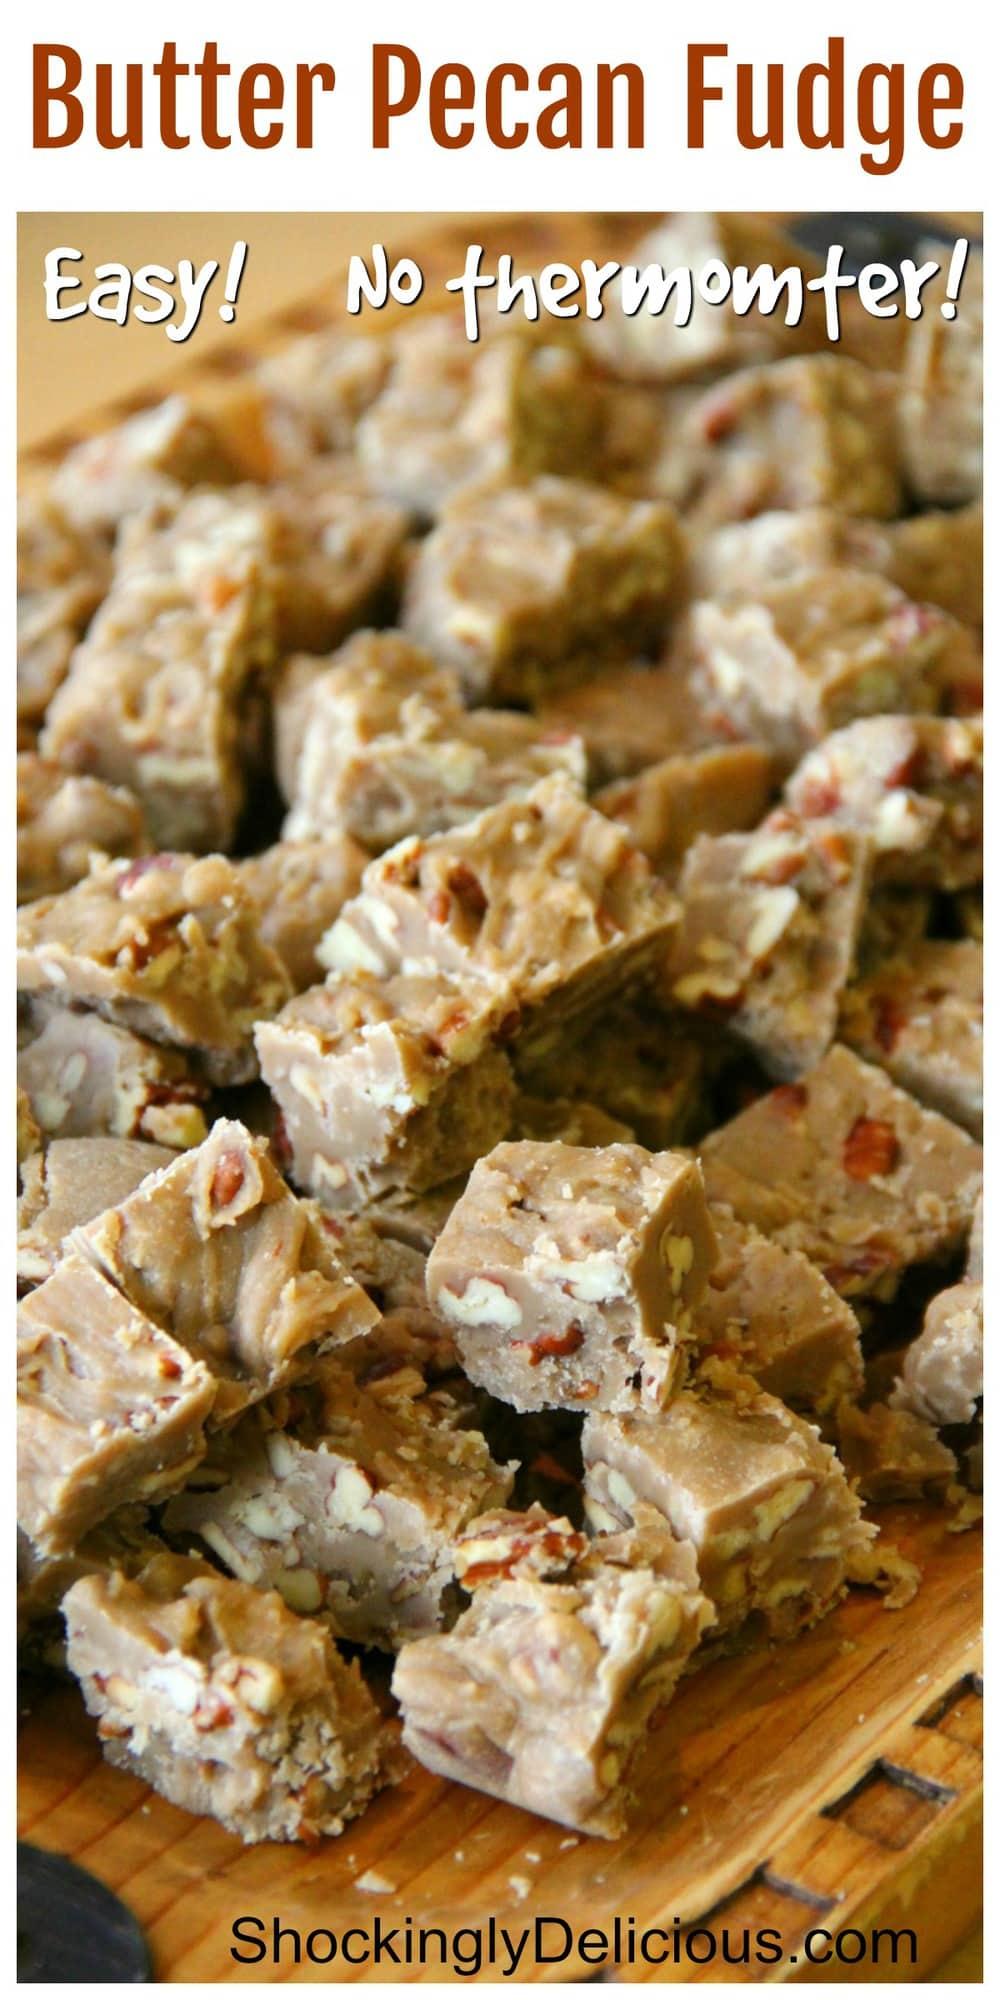 Butter Pecan Fudge Recipe on ShockinglyDelicious.com